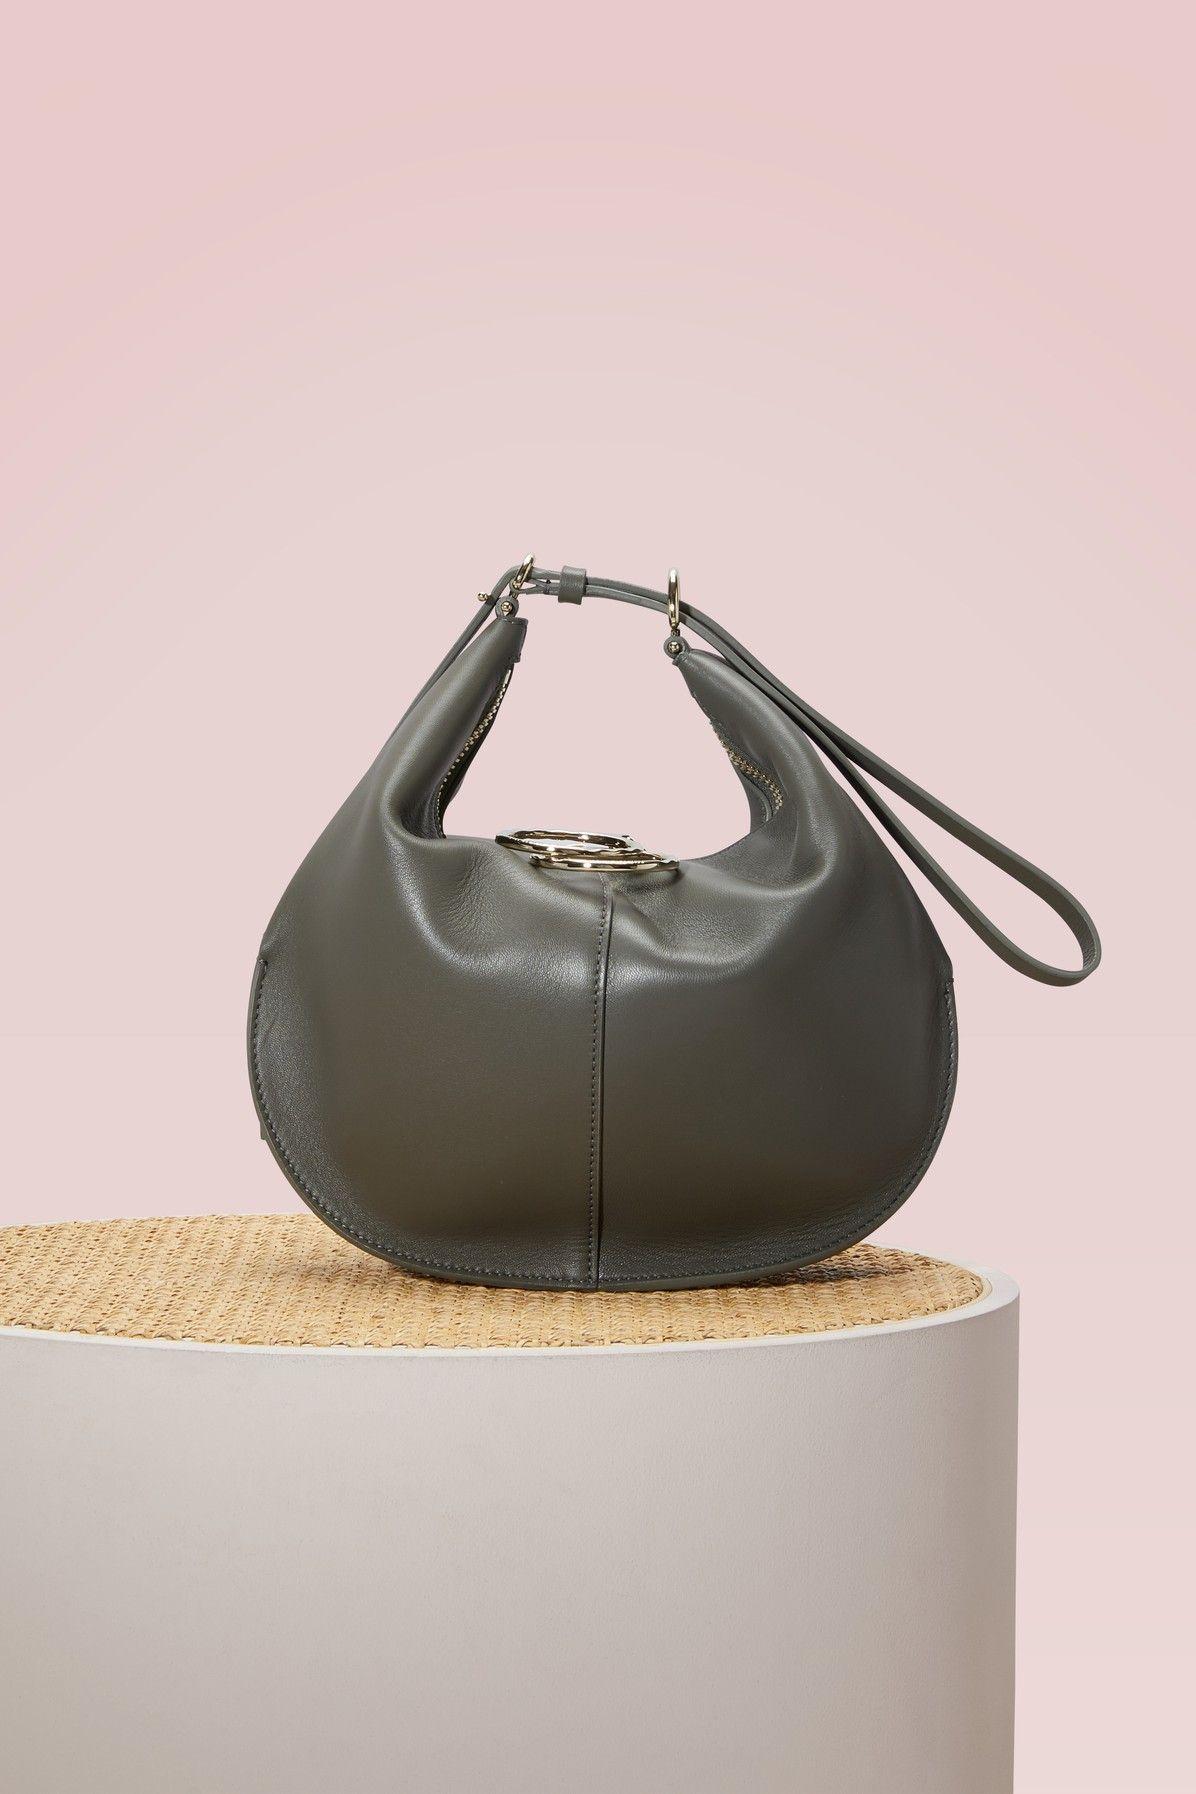 6135b34fba NINA RICCI Kuti baluchon handbag.  ninaricci  bags  shoulder bags  leather   lace  hobo